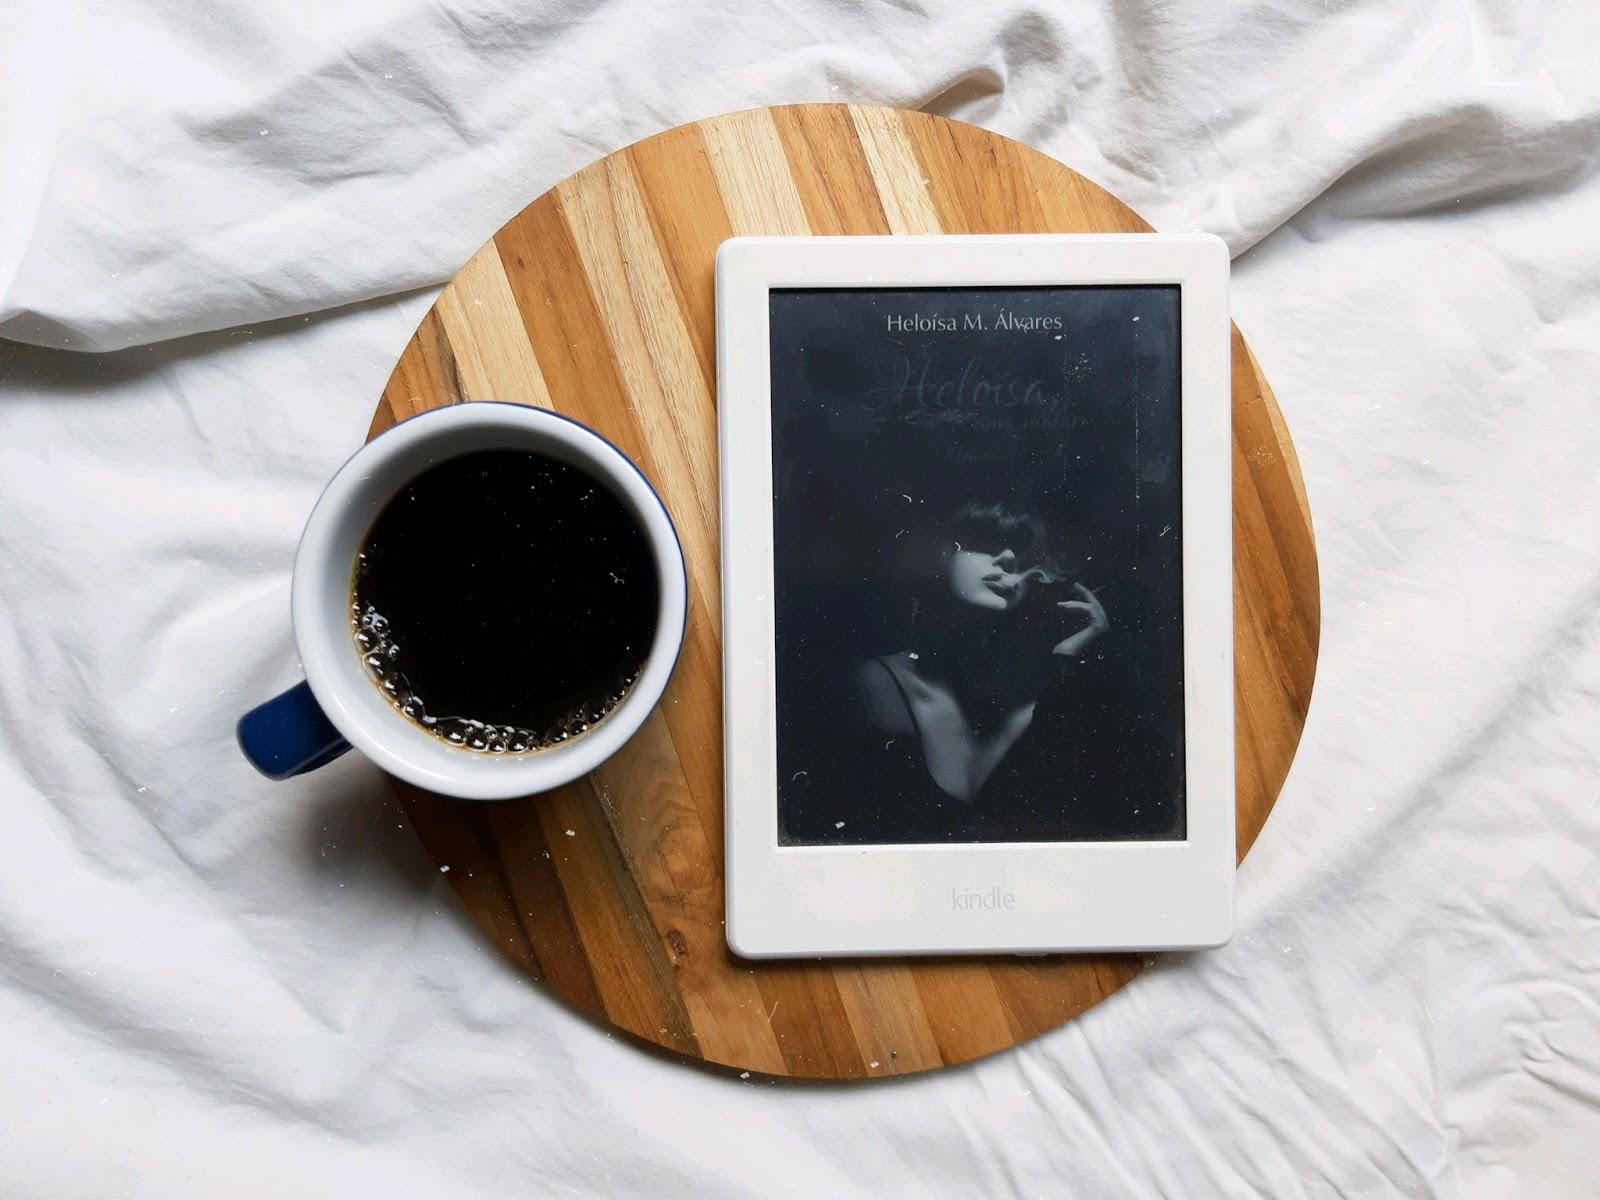 Heloísa, uma mulher: memórias - Heloísa M. Álvares | Resenha